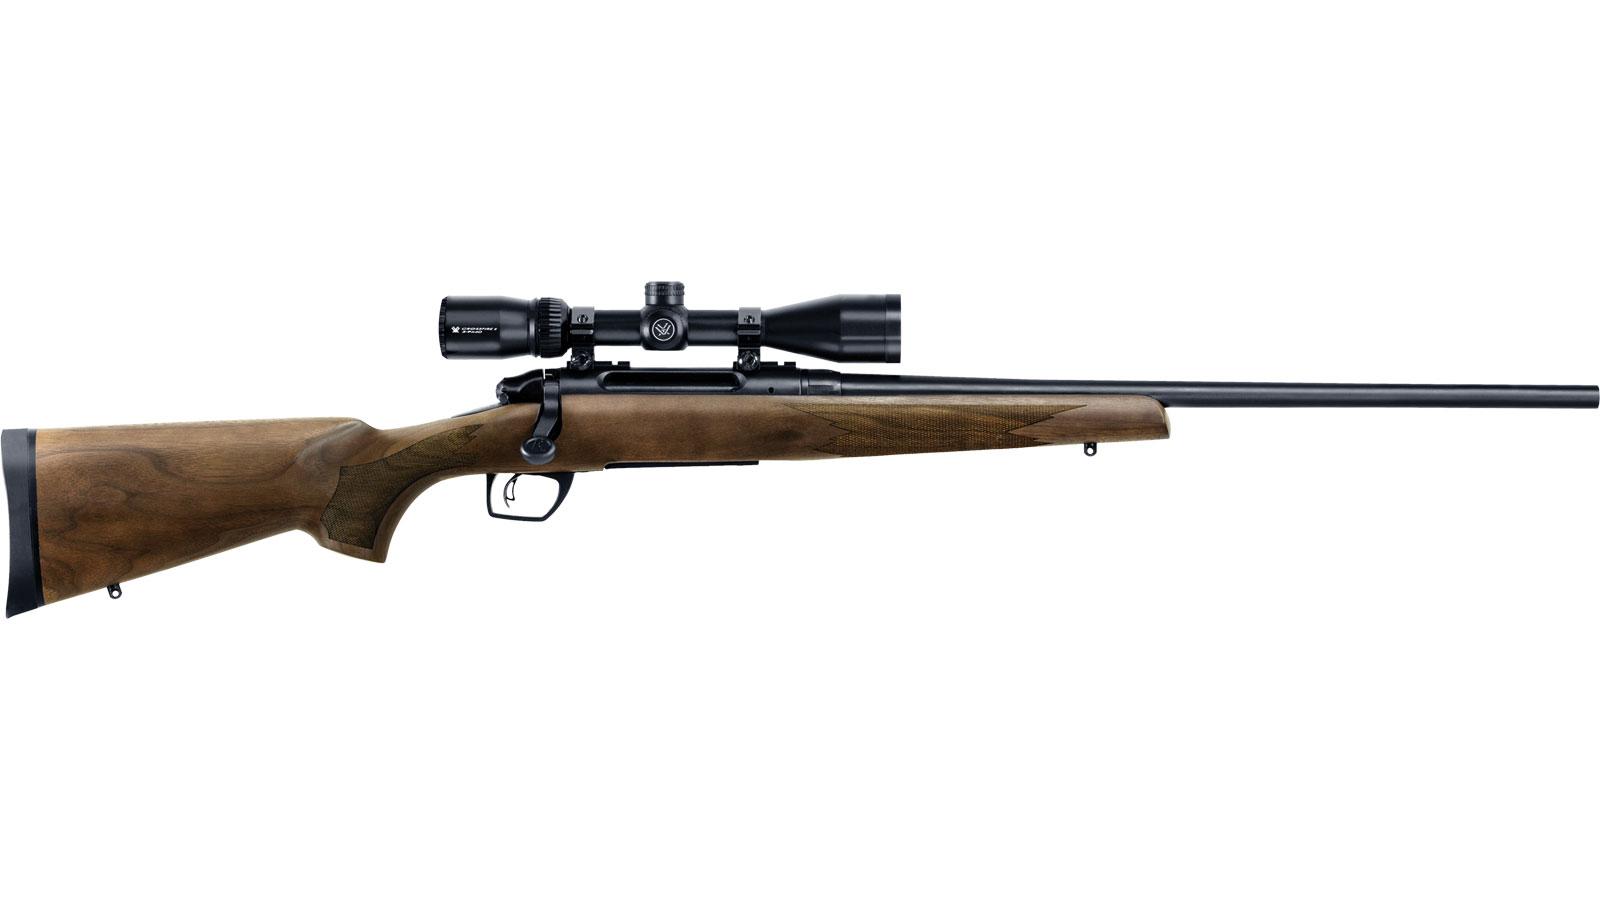 Remington Firearms 85888 783 with Scope Bolt 30-06 Springfield 22 4+1 American Walnut Stk Blued in.